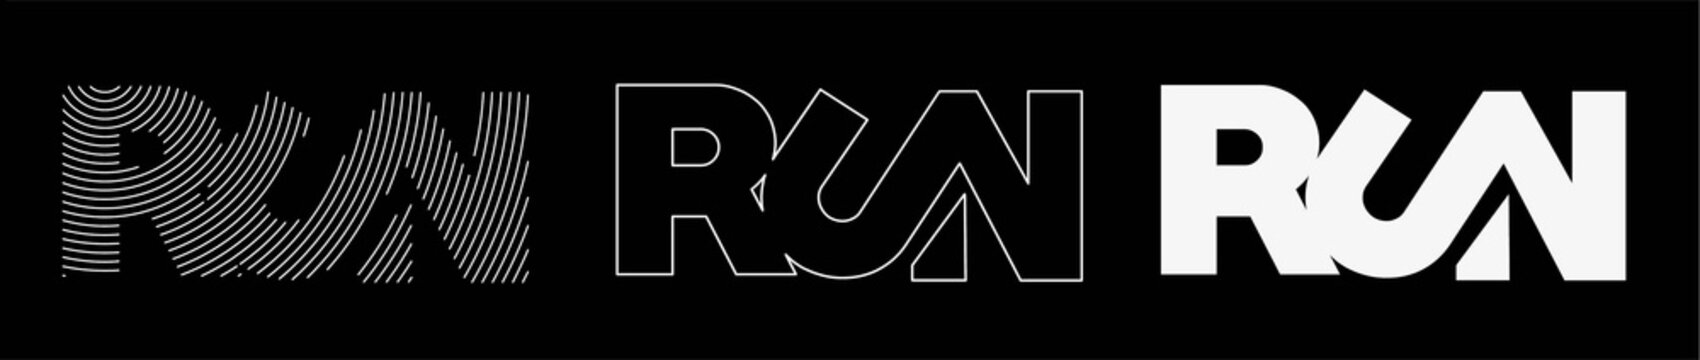 Run calligraphic text vector illustration design.